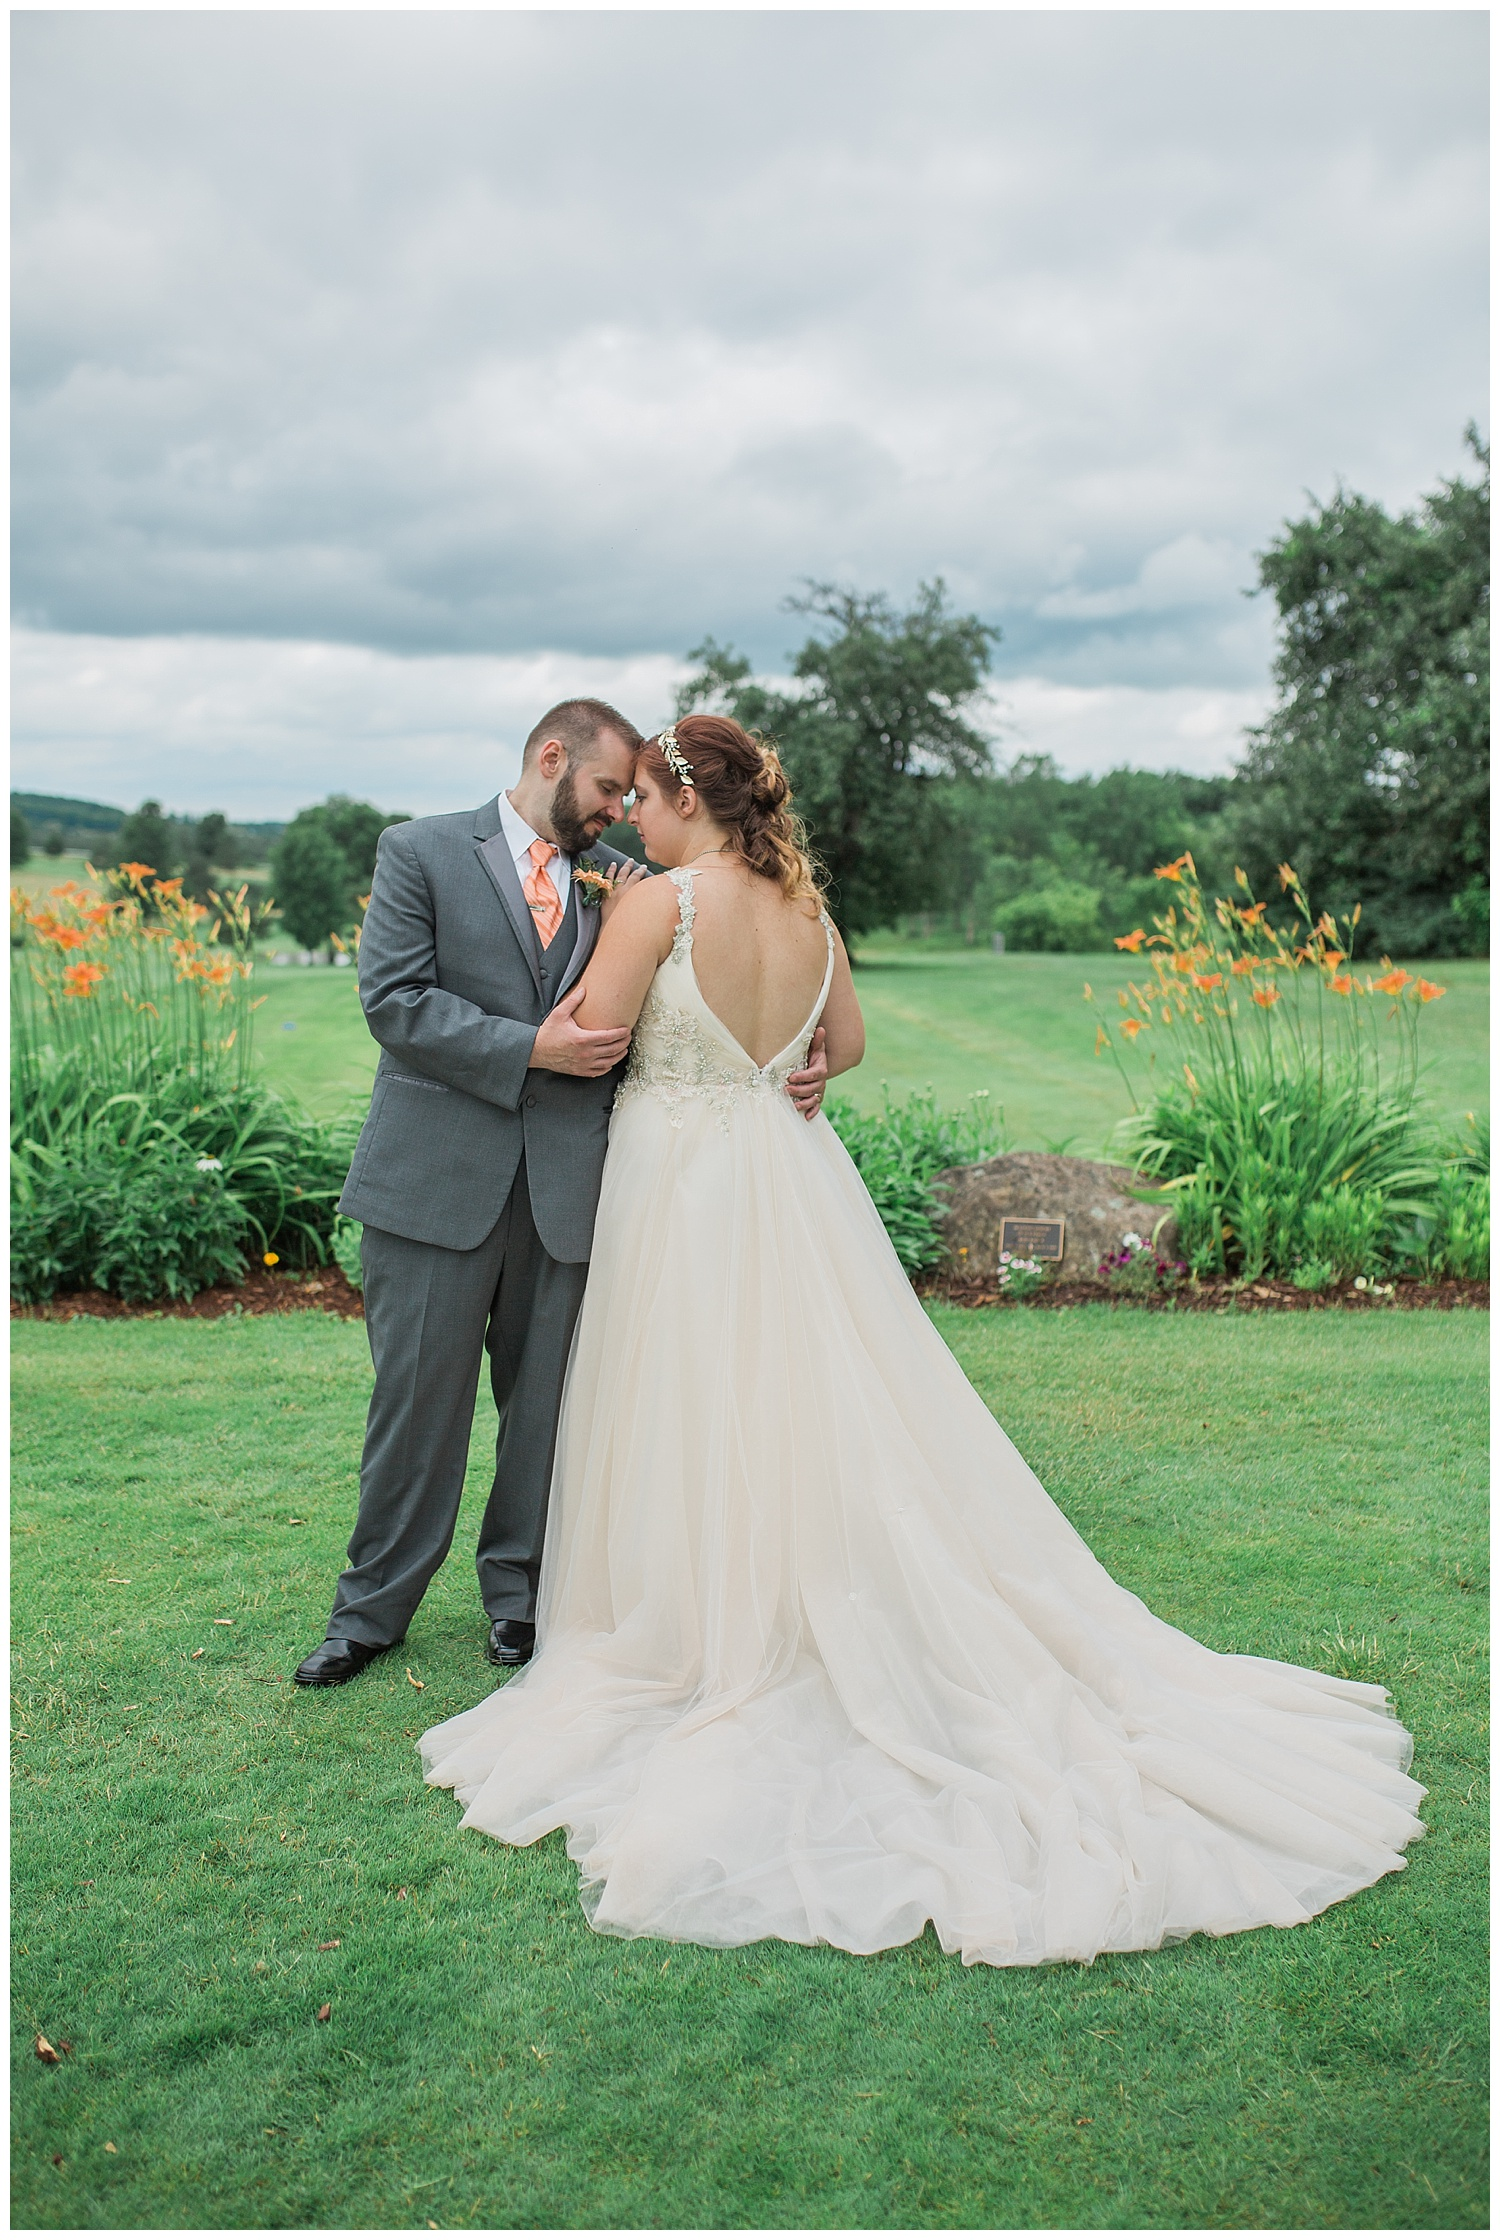 Brian and Molly Wed in Conesus NY - Lass & Beau-800_Buffalo wedding photography.jpg